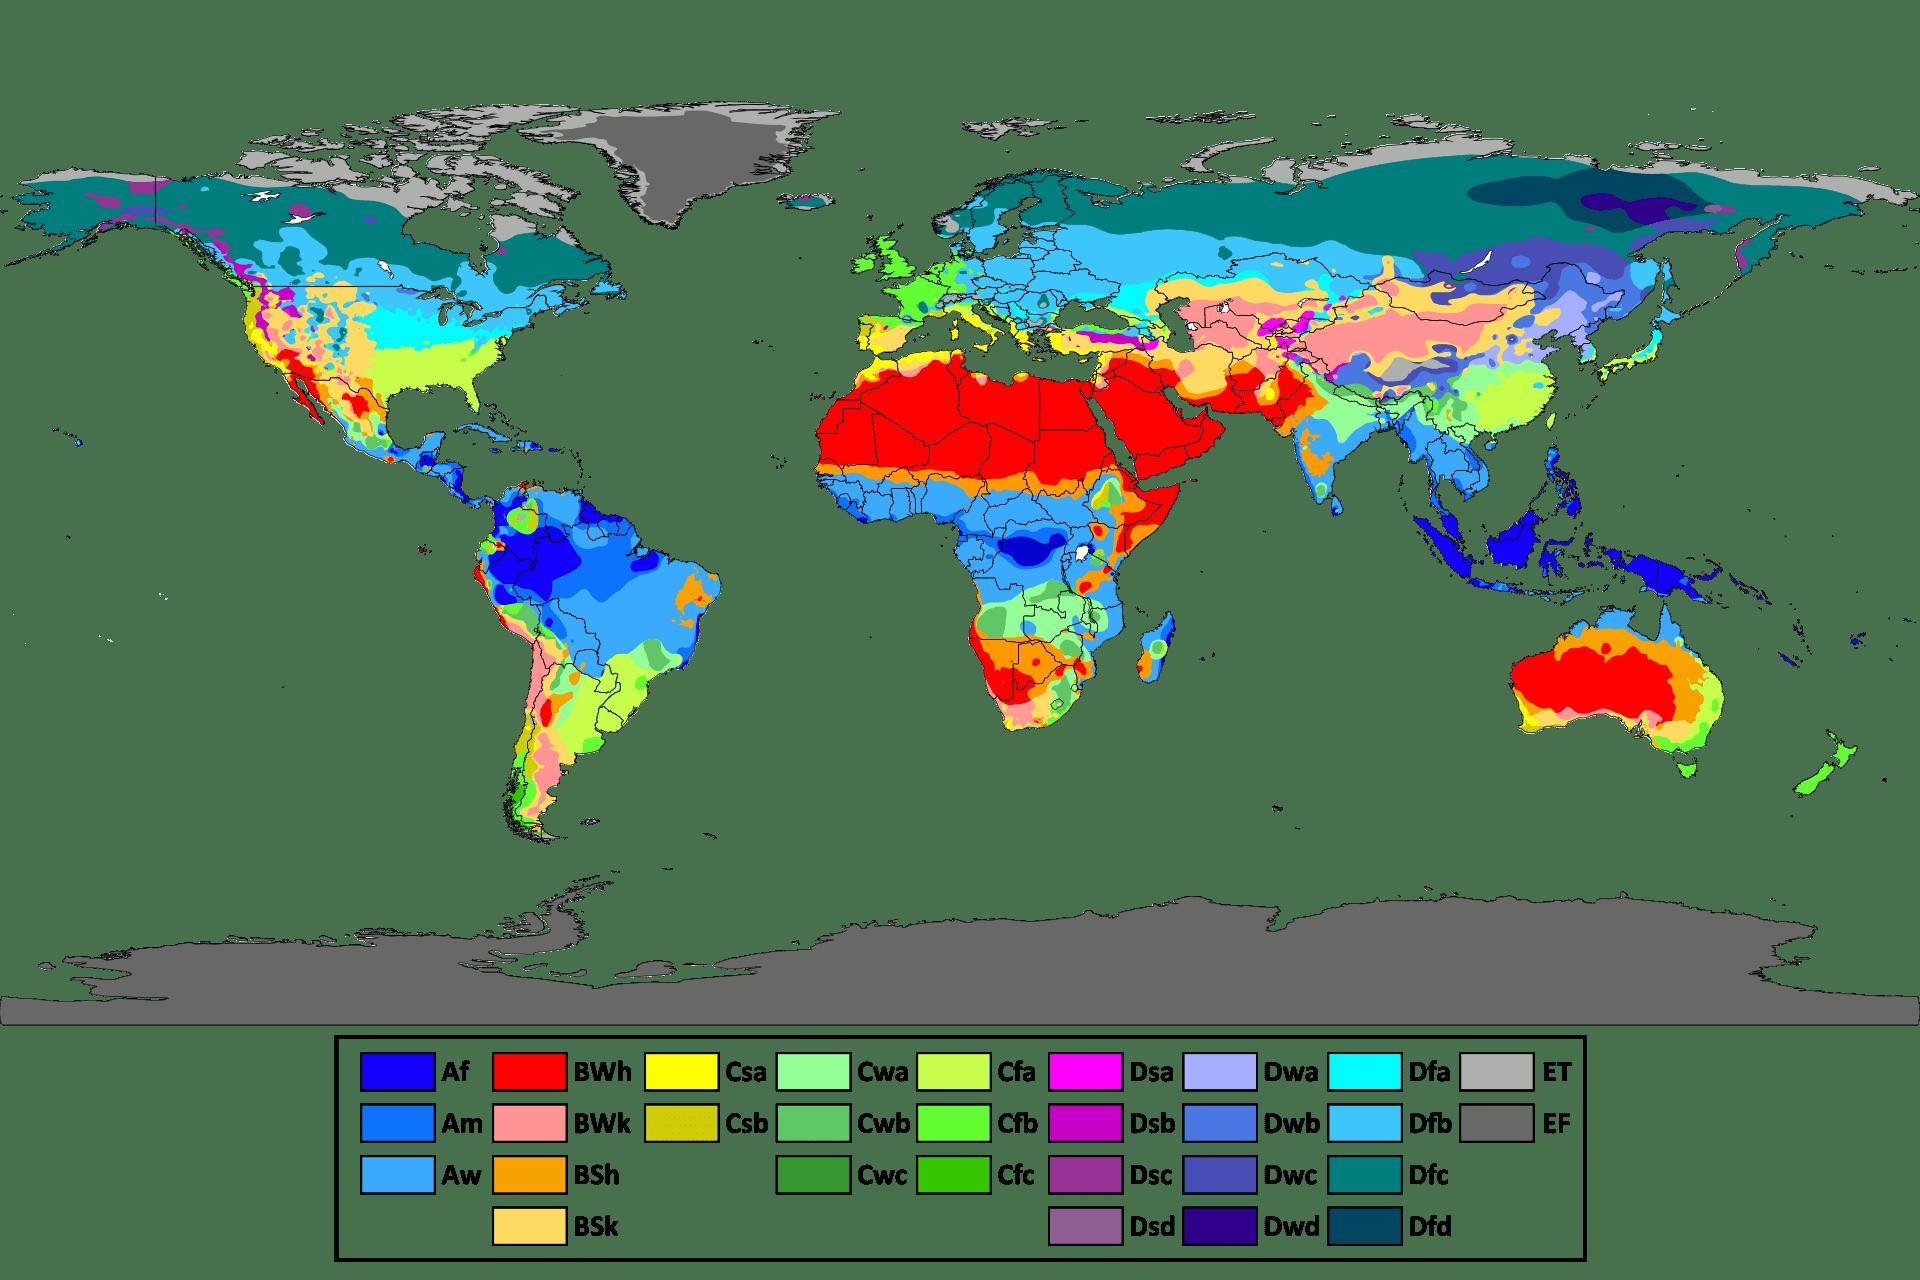 Классификация климатов Кёппена